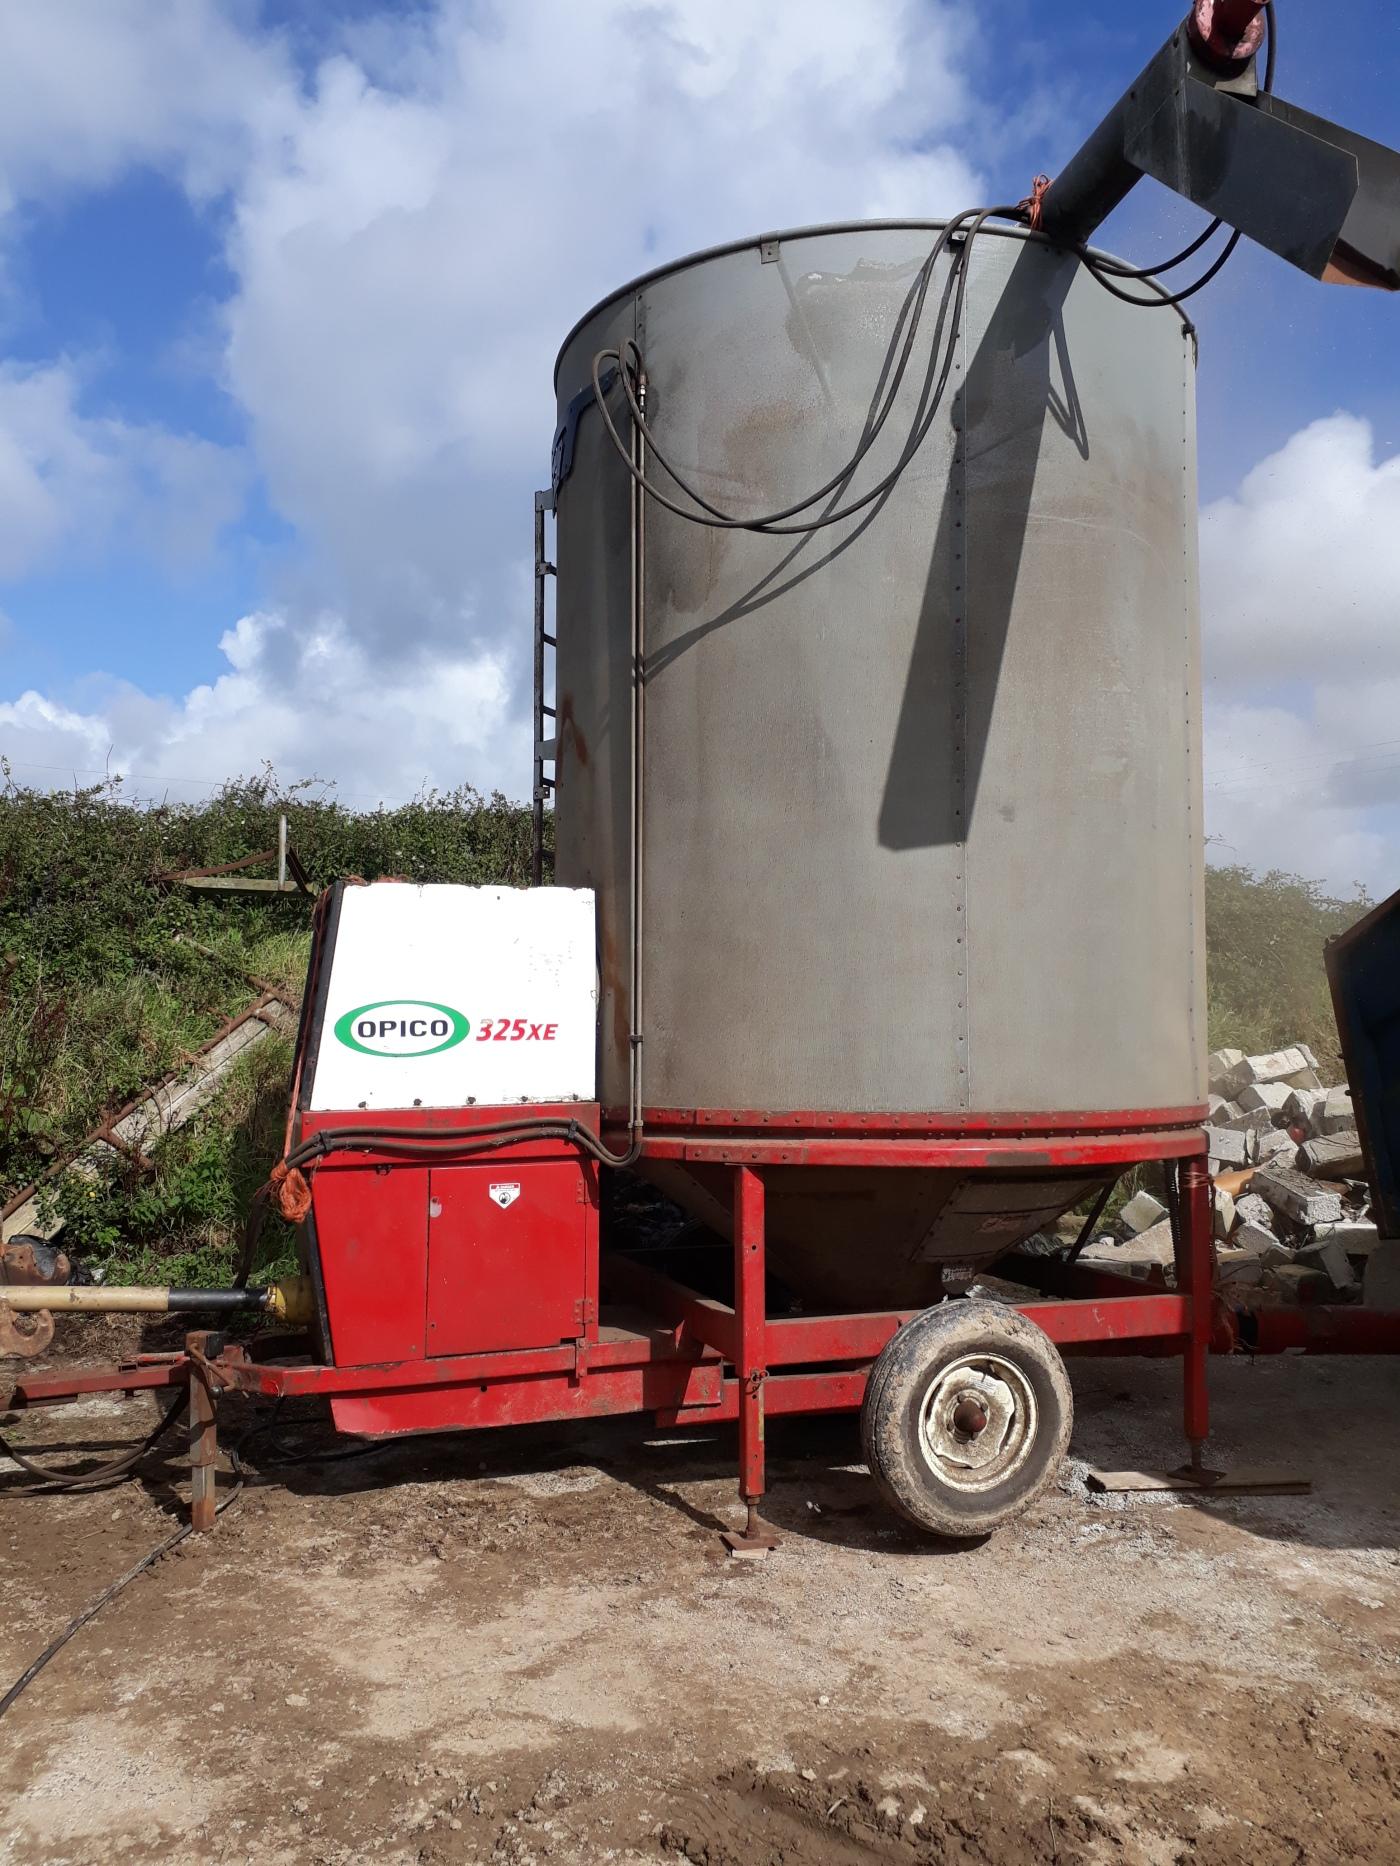 Opico 325 XE Grain Dryer | A G PROWSE LTD